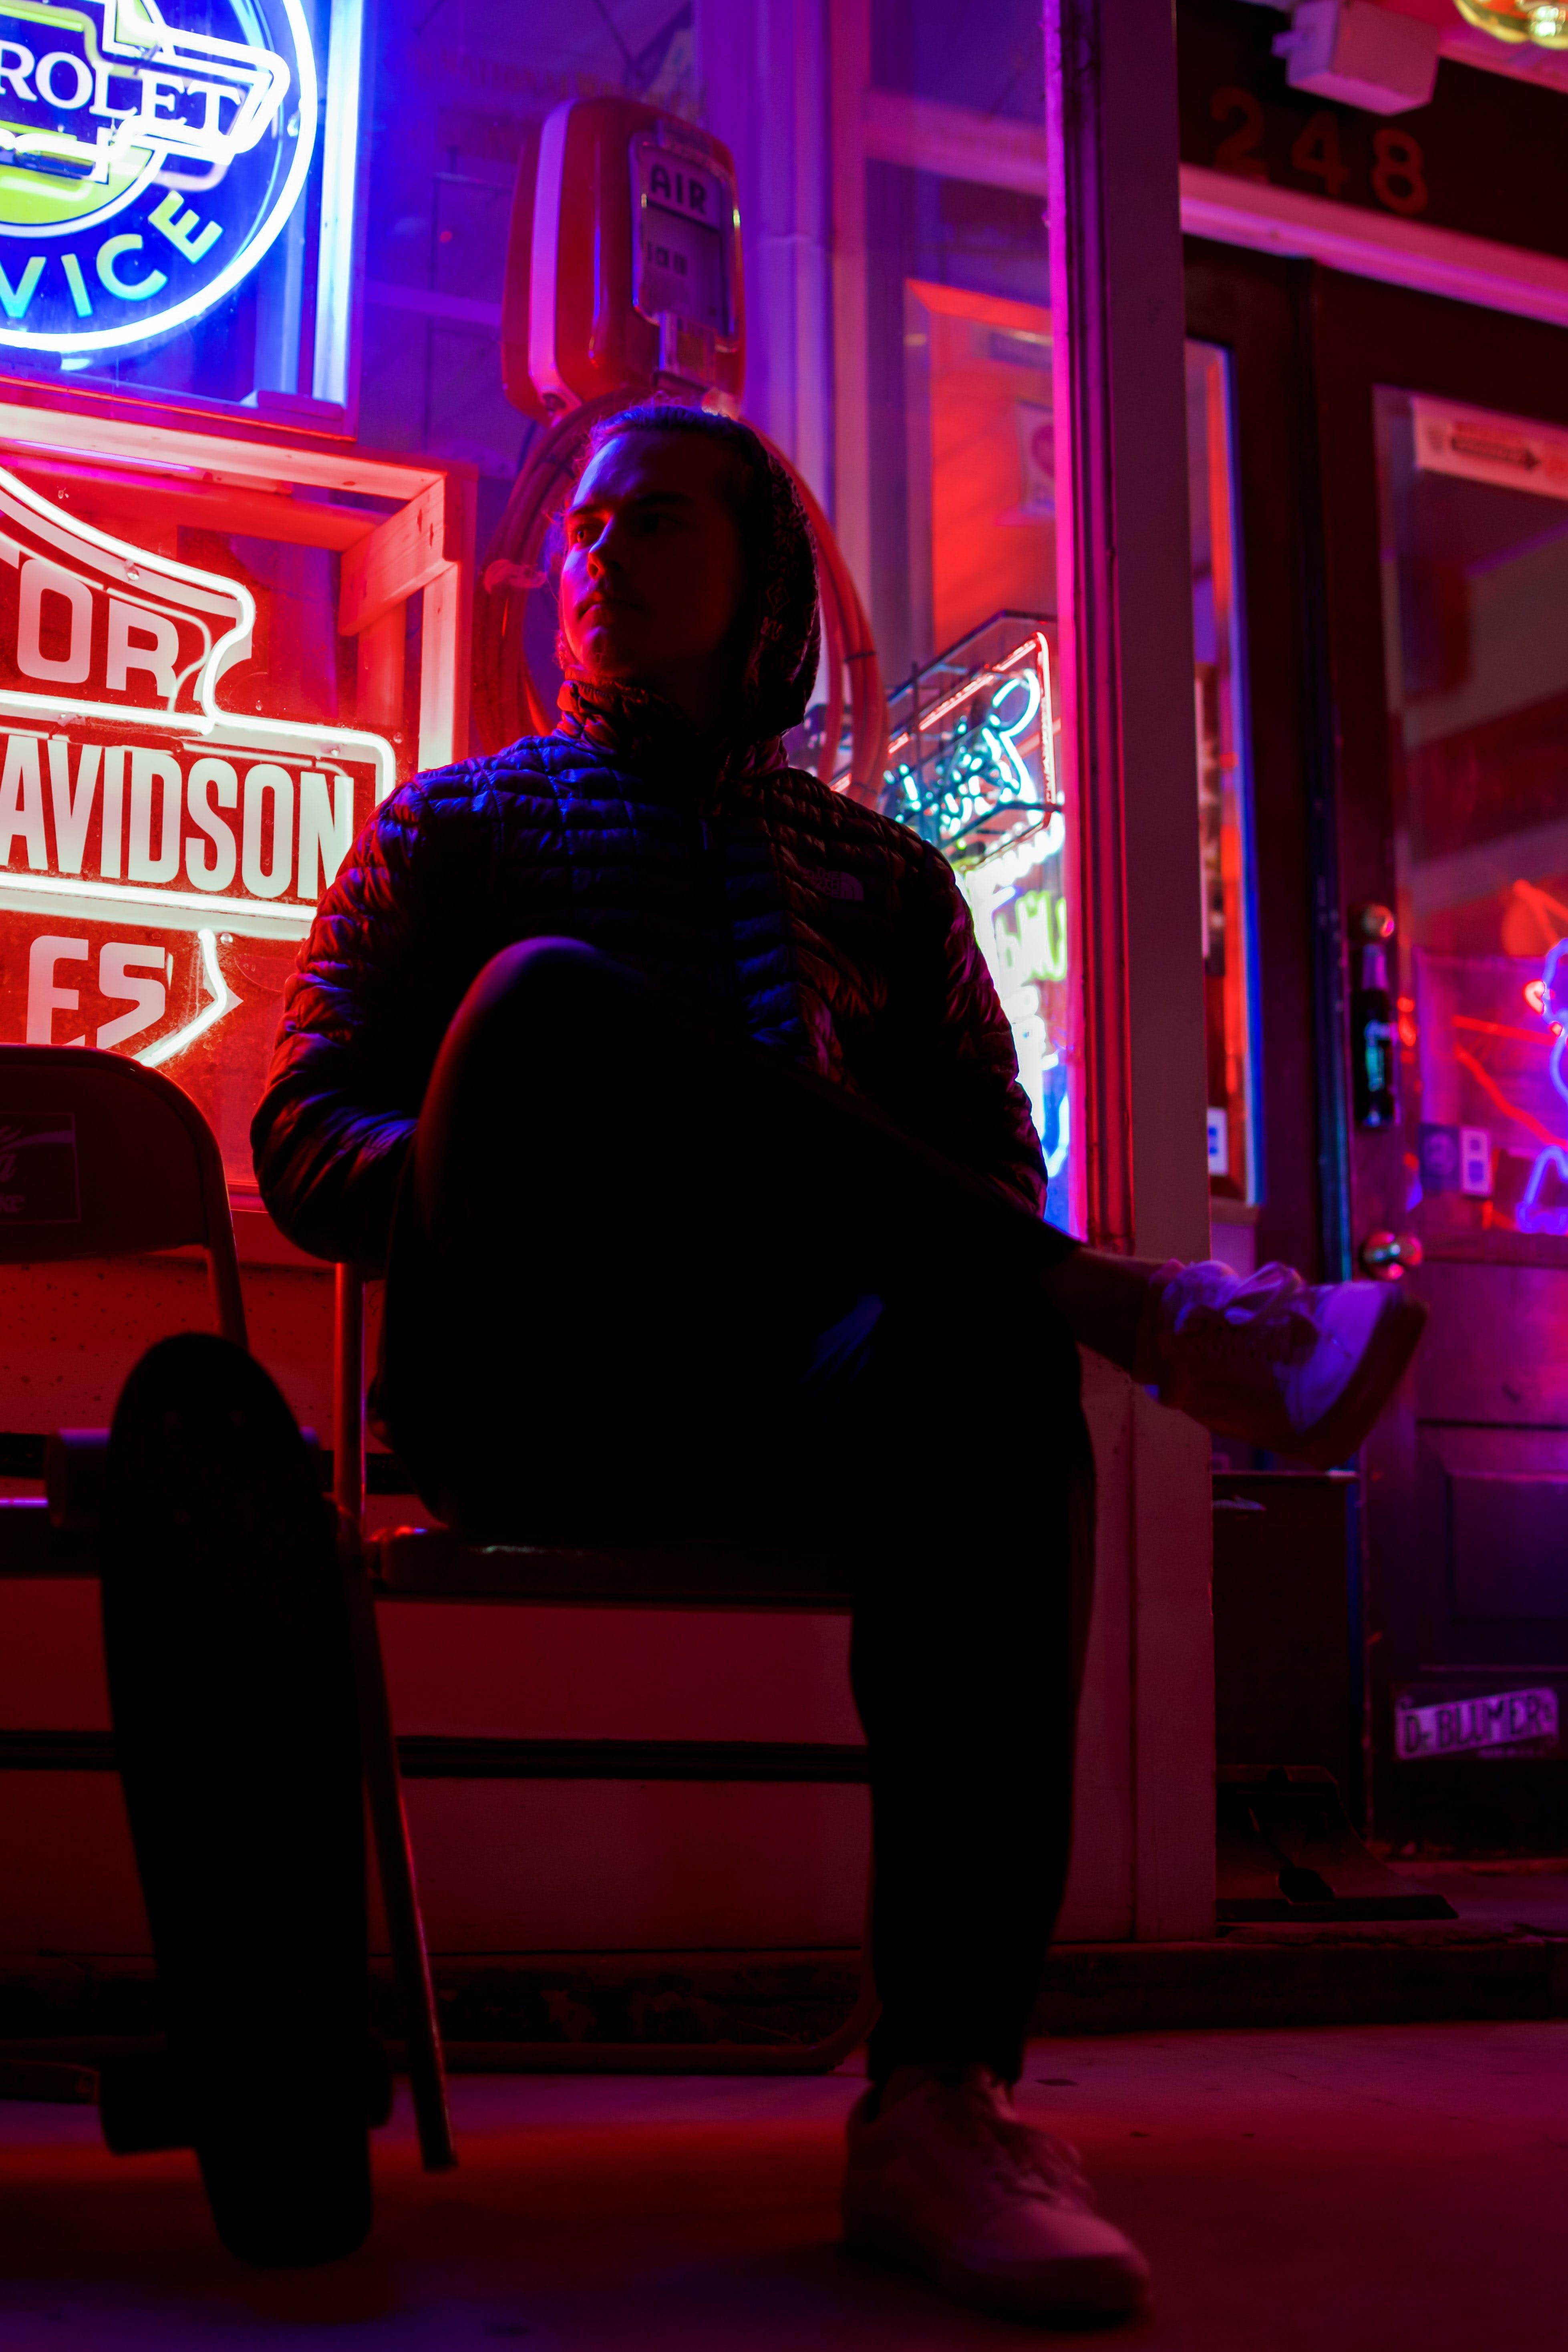 Man Sitting on Chair Cross Leg